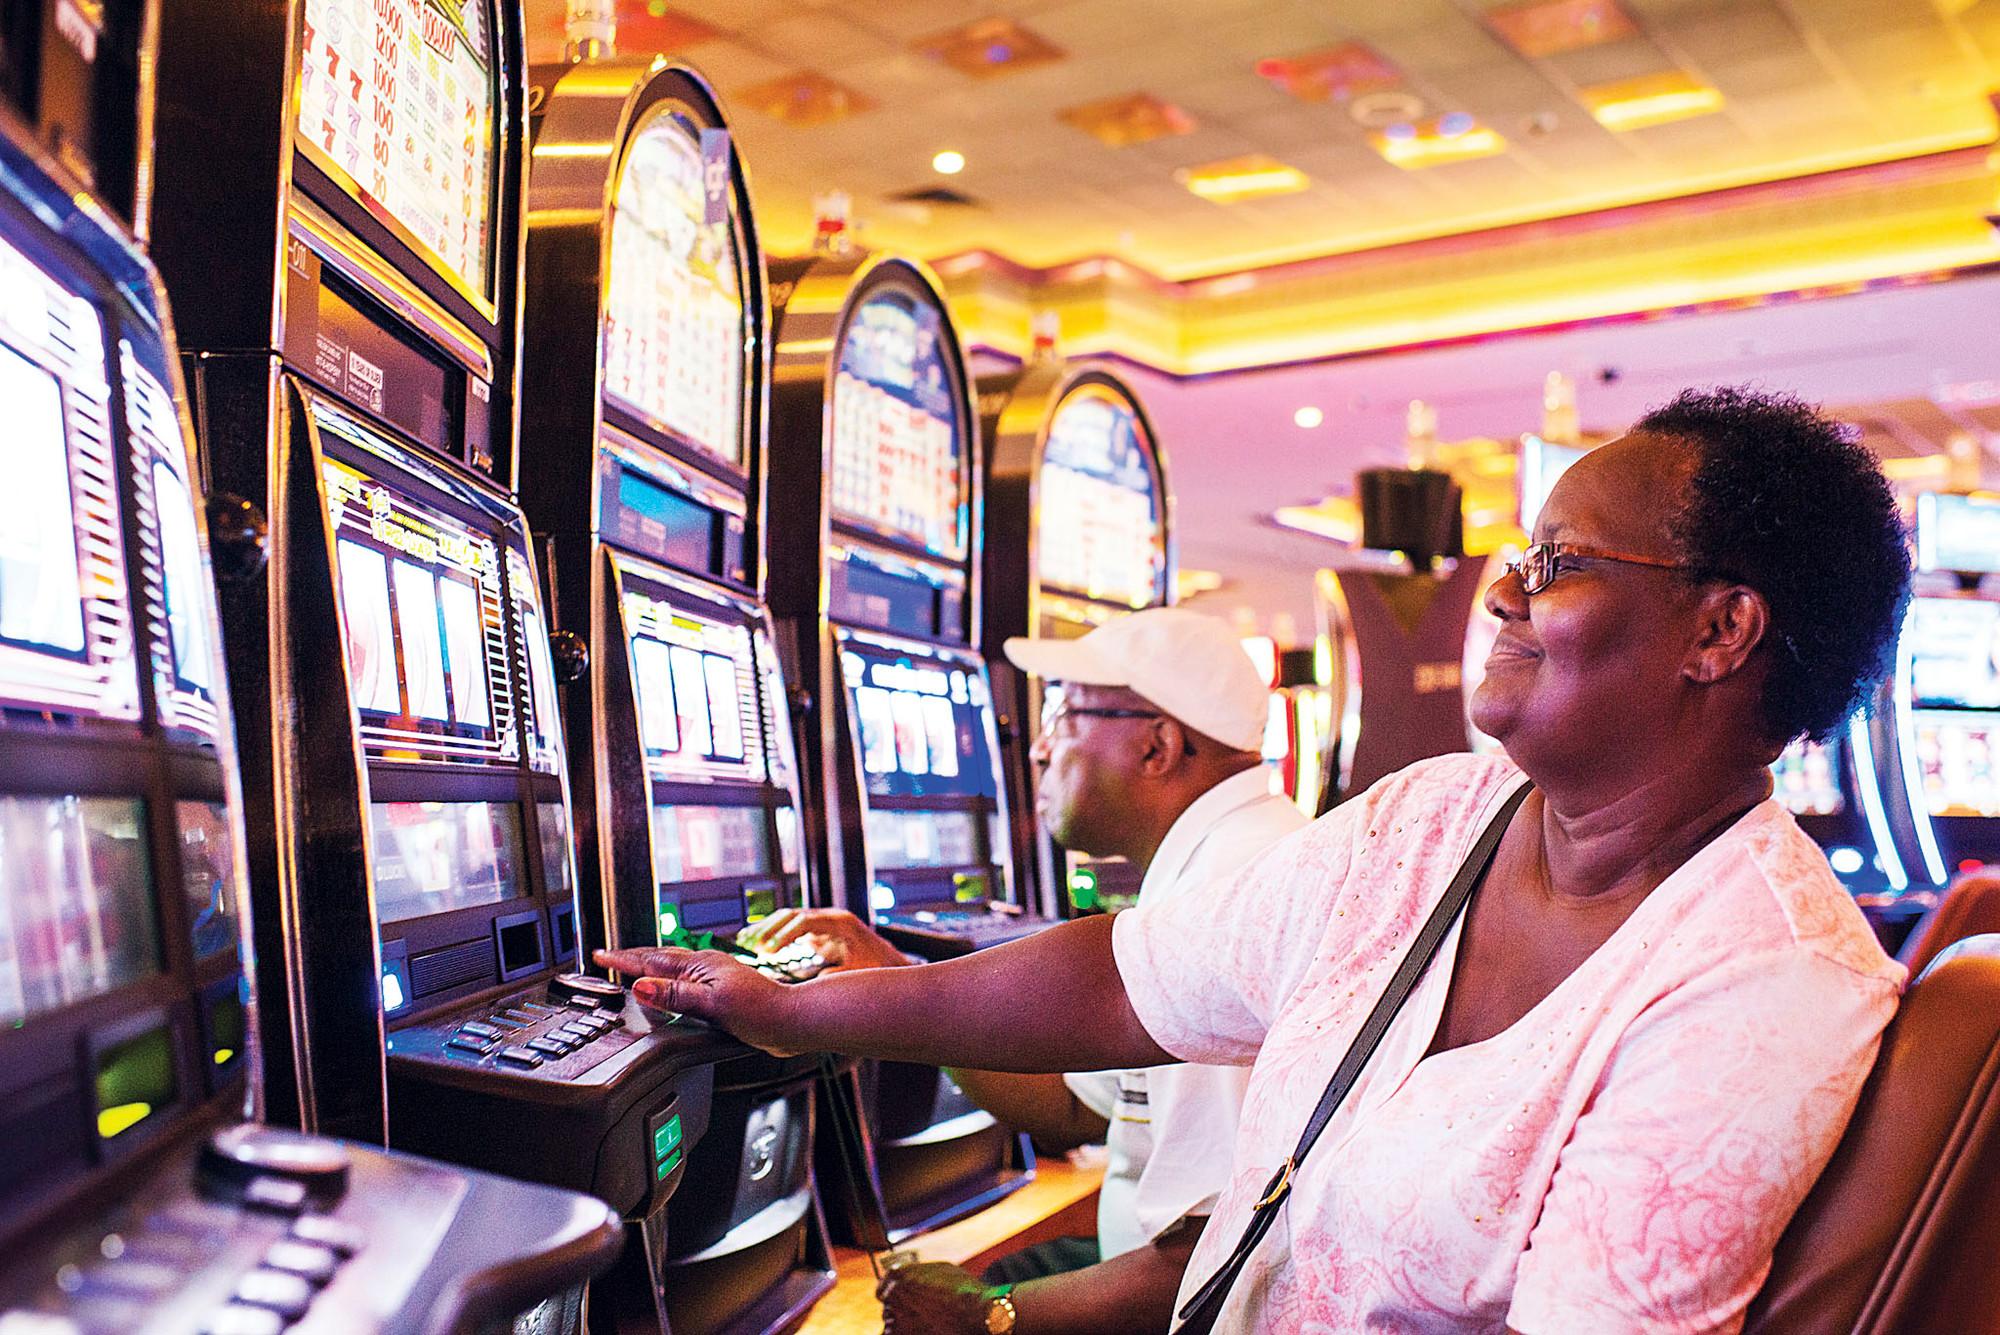 $1 bus to empire casino